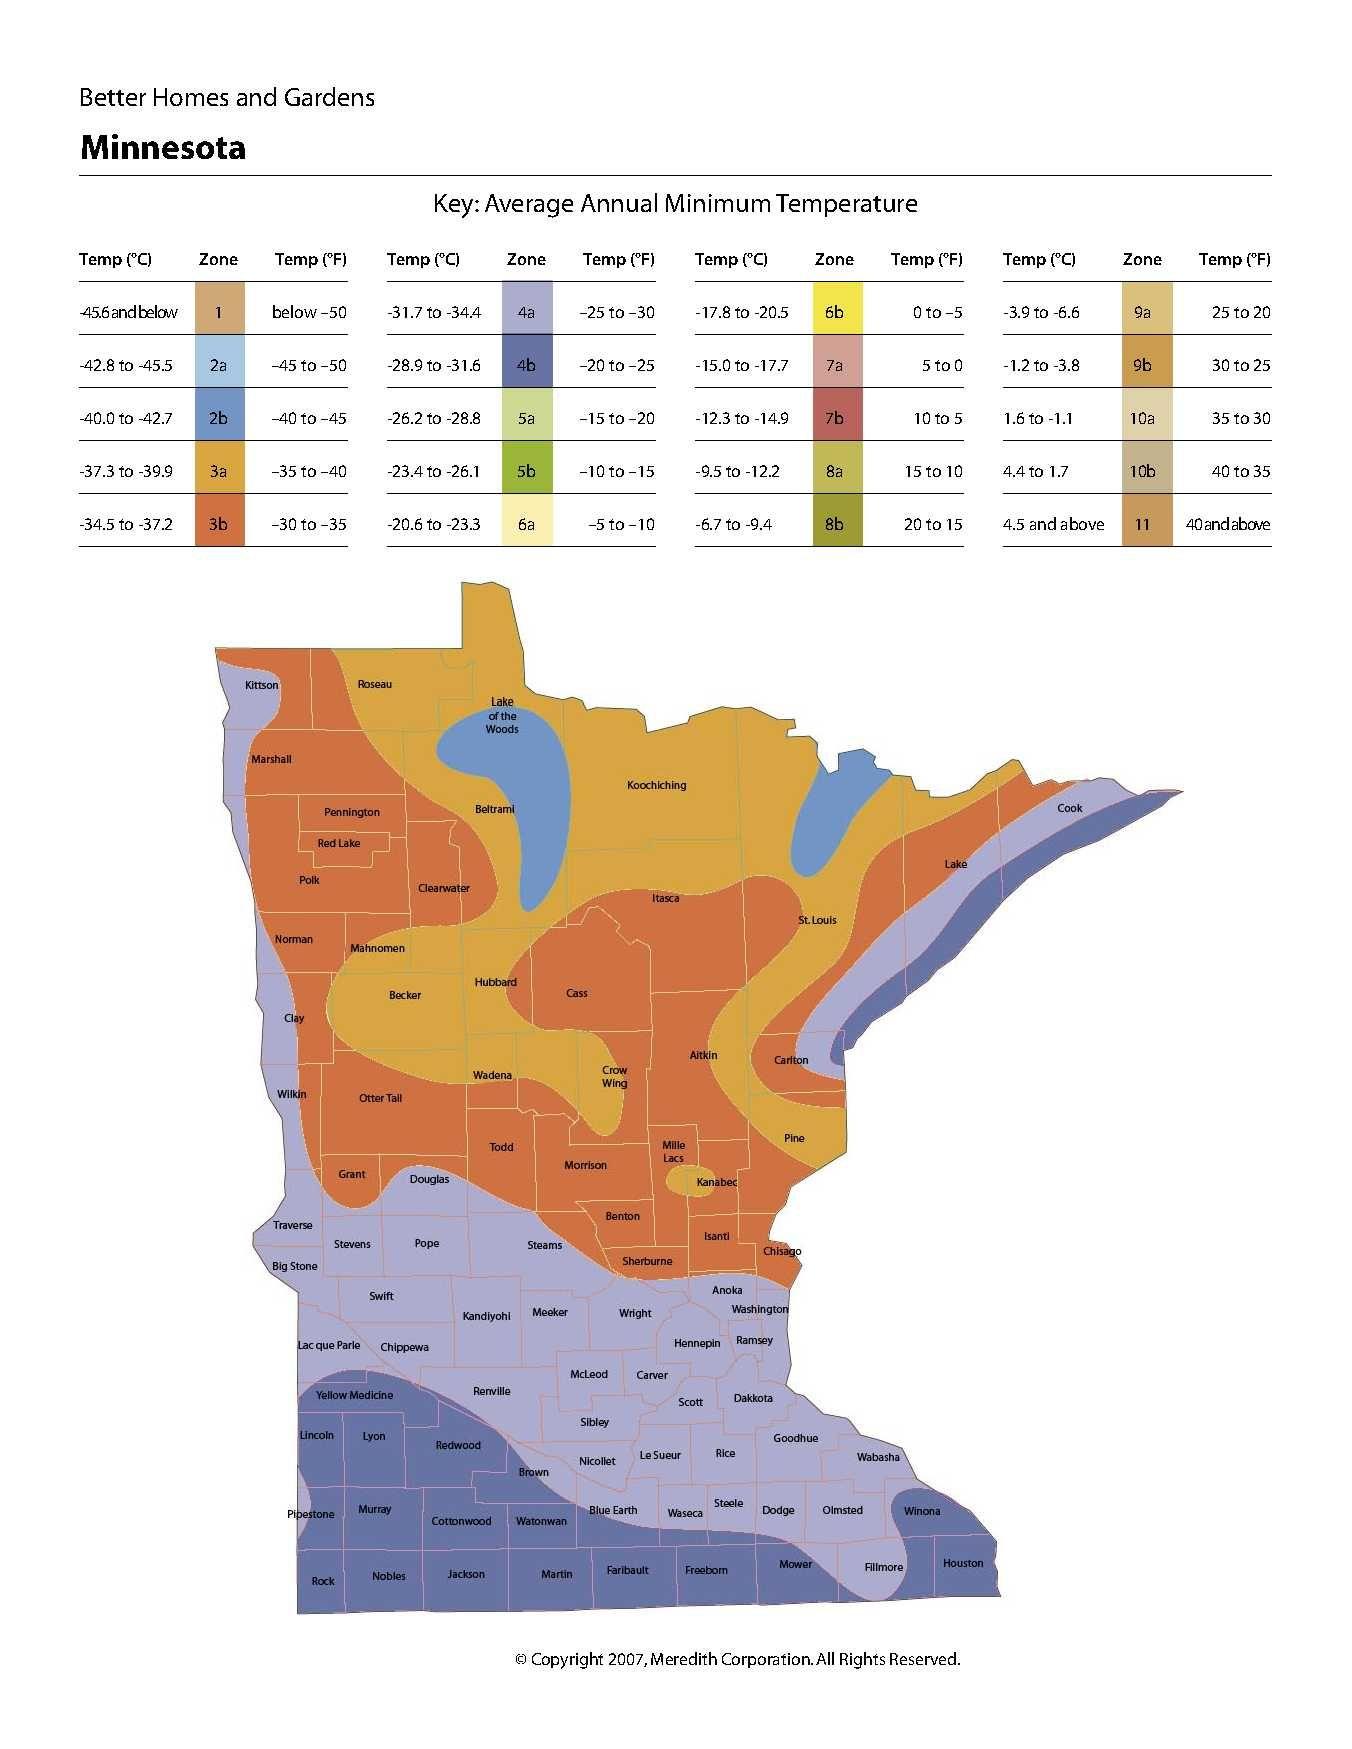 840d64b9239efa664a77aa56afae688e - What Gardening Zone Is Minnesota In